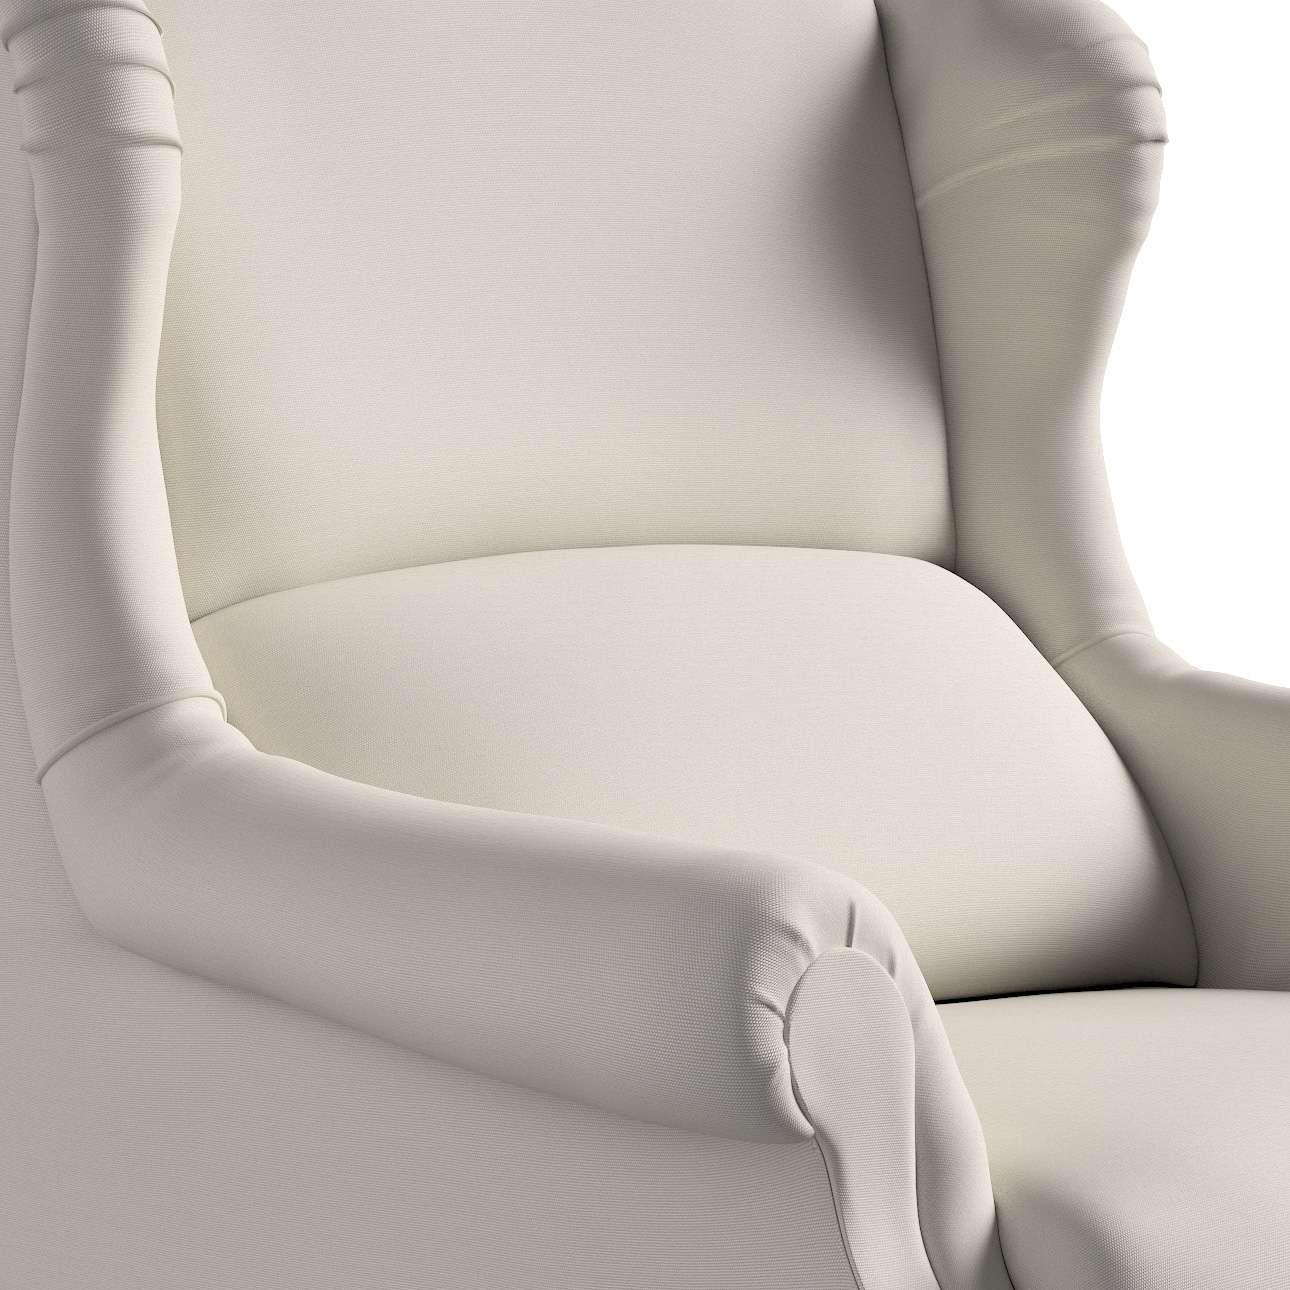 Sessel Unique von der Kollektion Cotton Panama, Stoff: 702-31